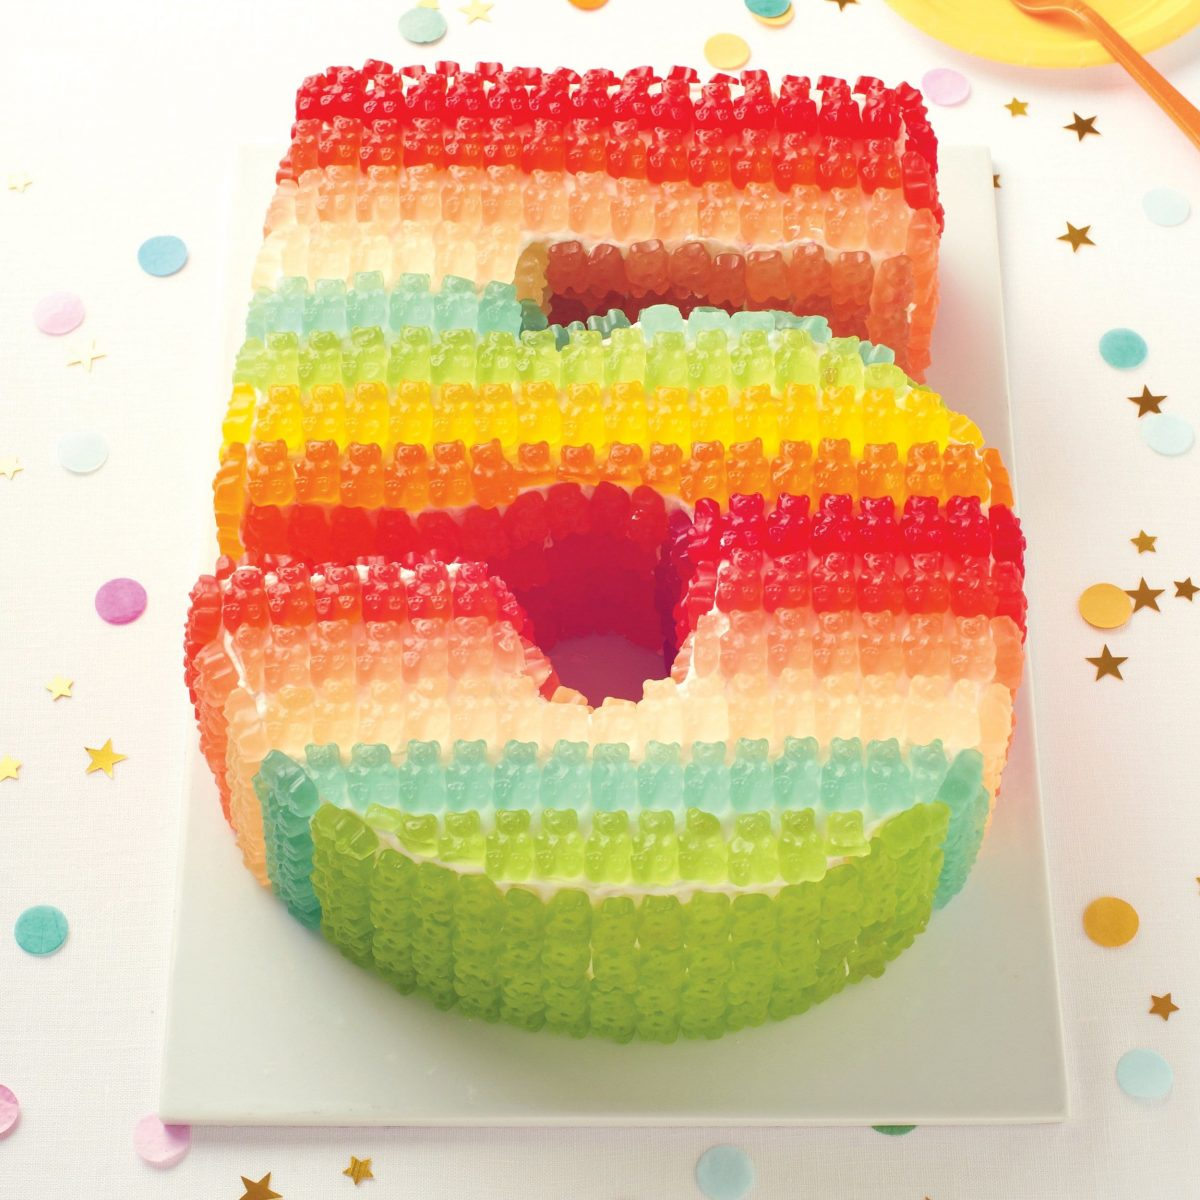 gb-cake-dmd